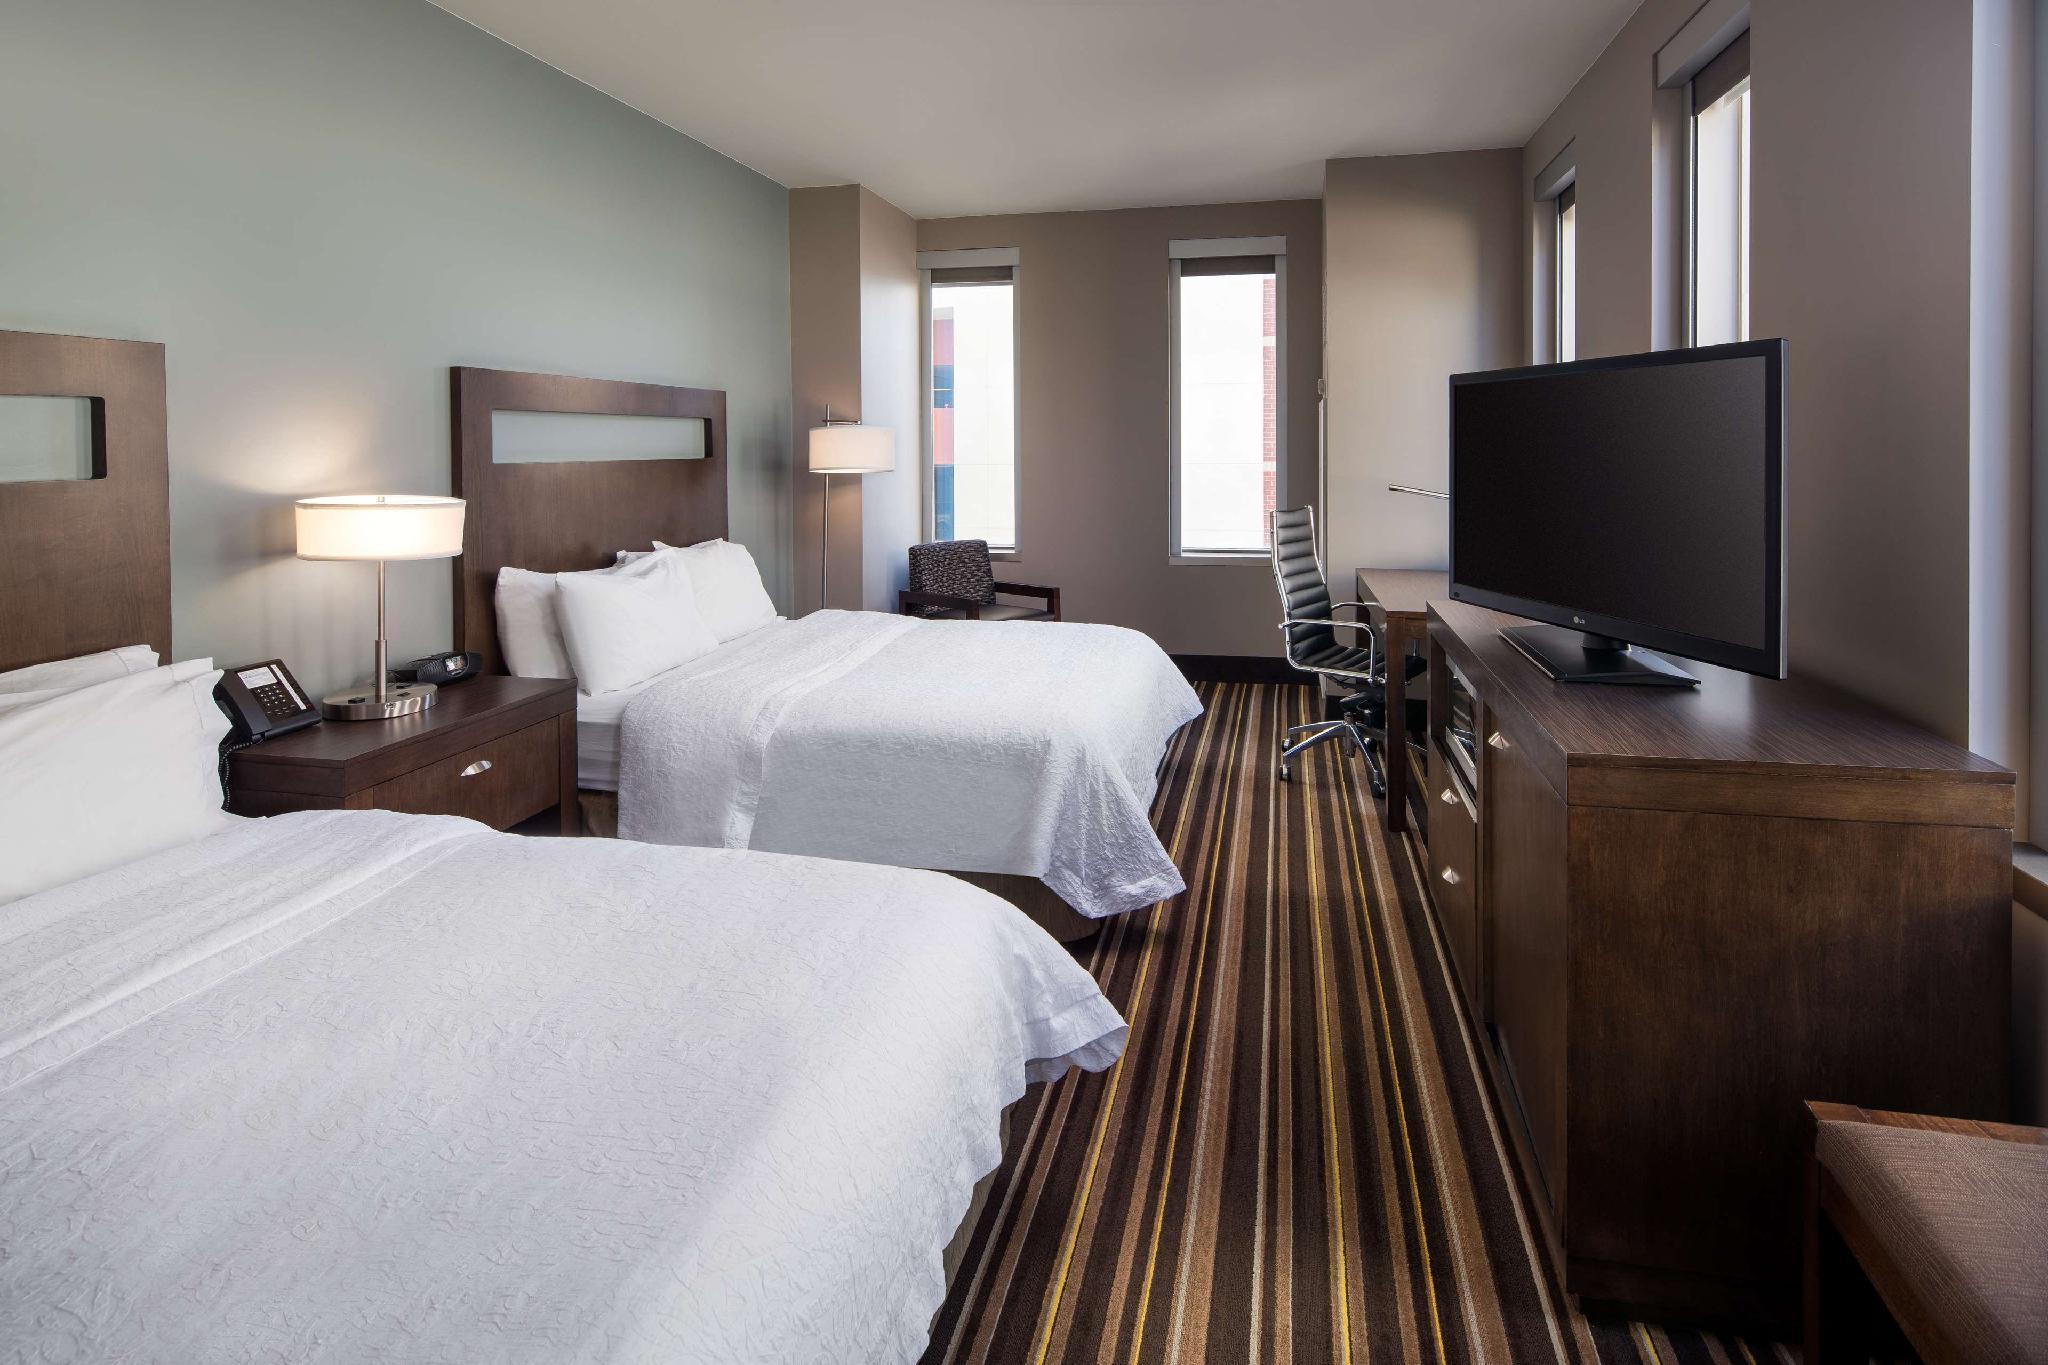 Astounding Hampton Inn Suites Denver Downtown Convention Center Co Download Free Architecture Designs Viewormadebymaigaardcom